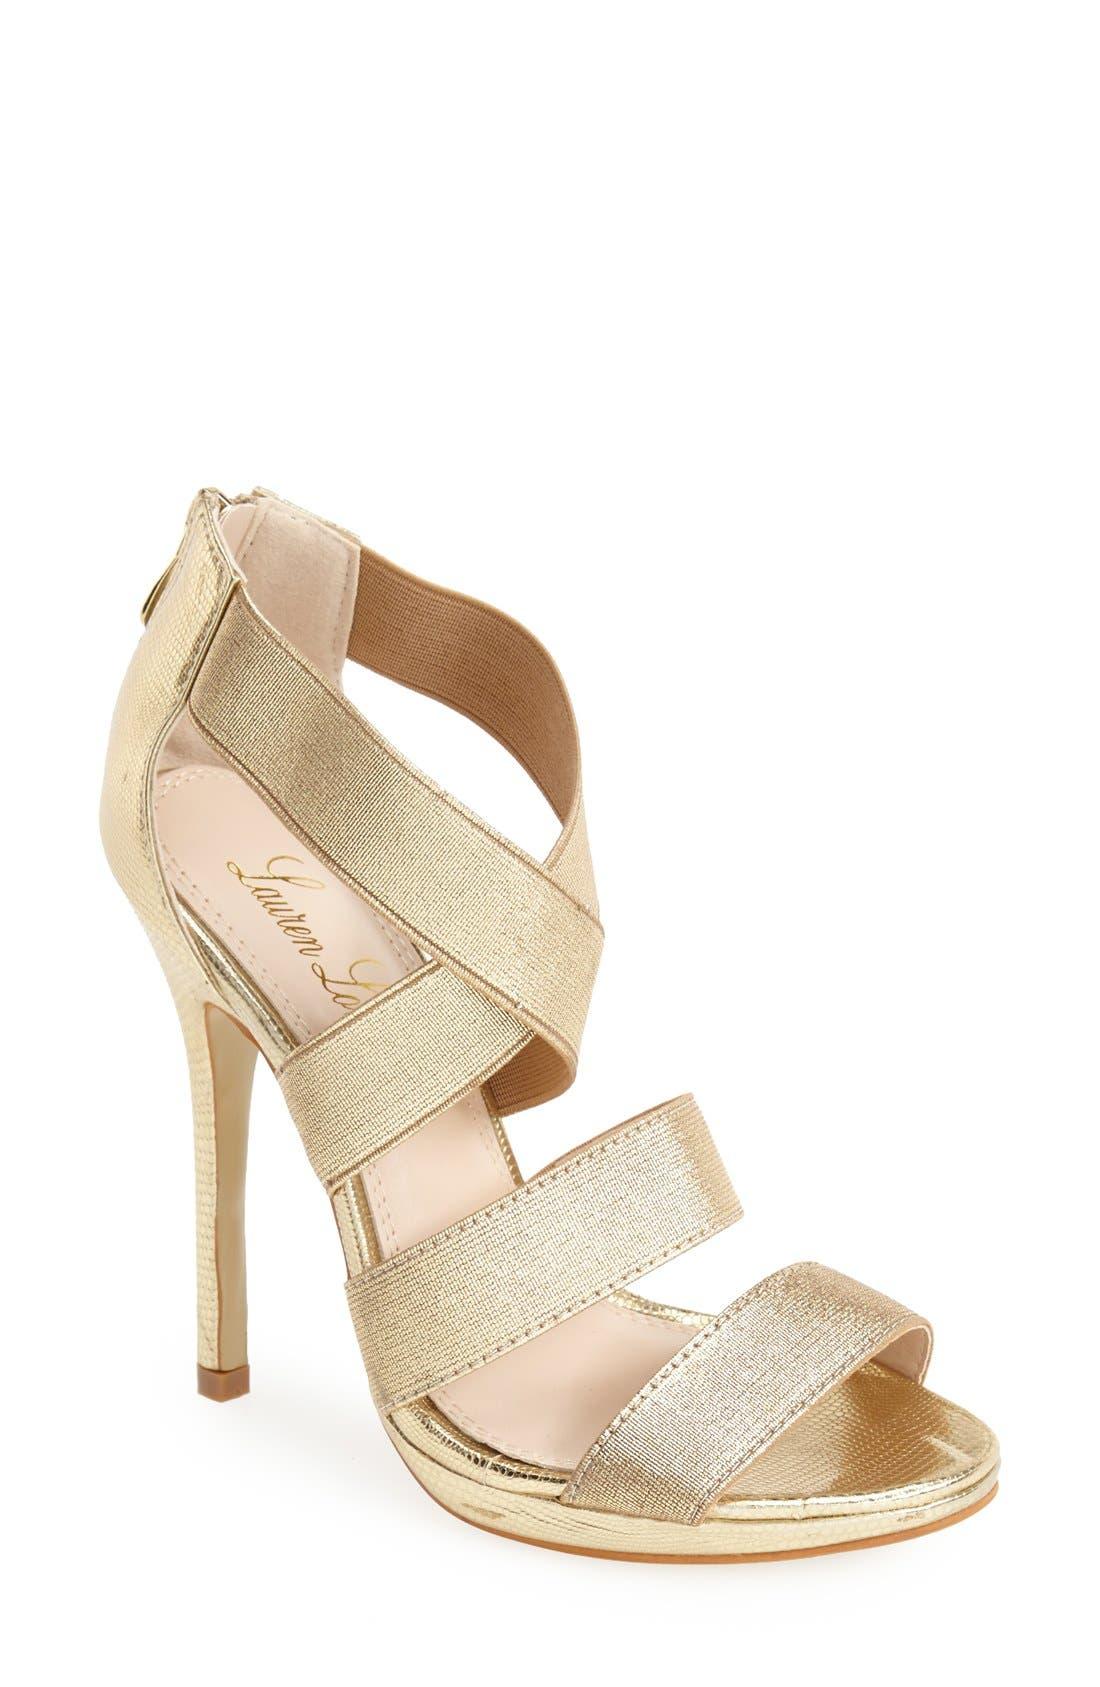 Alternate Image 1 Selected - Lauren Lorraine 'Lipsy' Platform Sandal (Women)